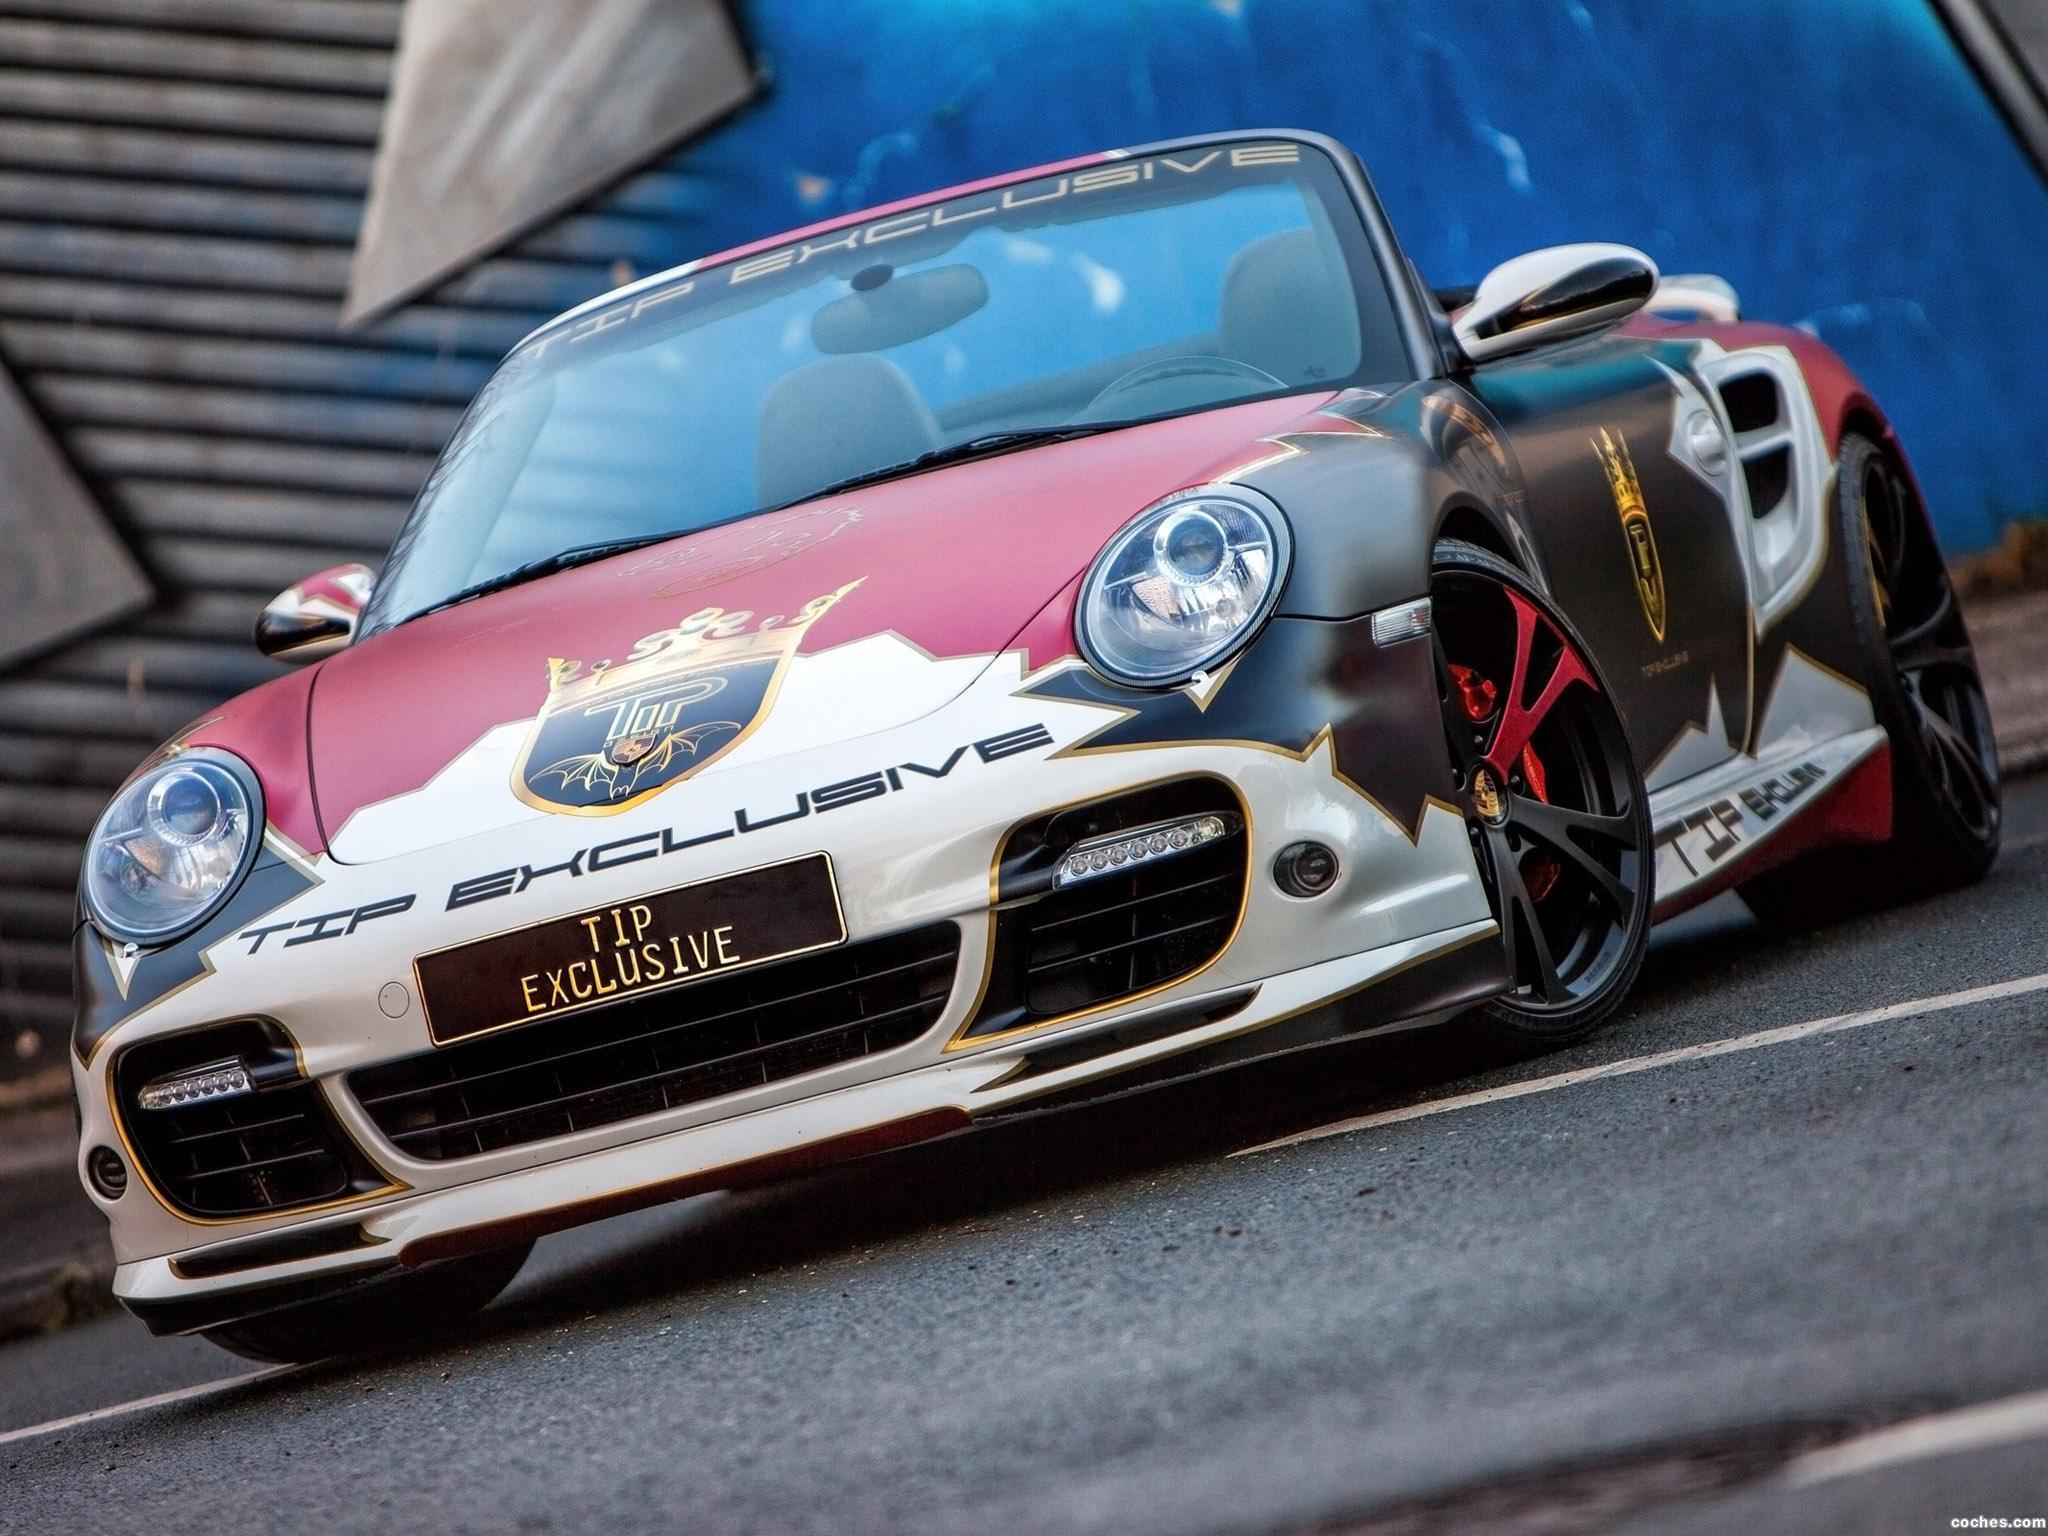 Foto 0 de Porsche 911 Turbo Convertible TIP Exclusive 2016